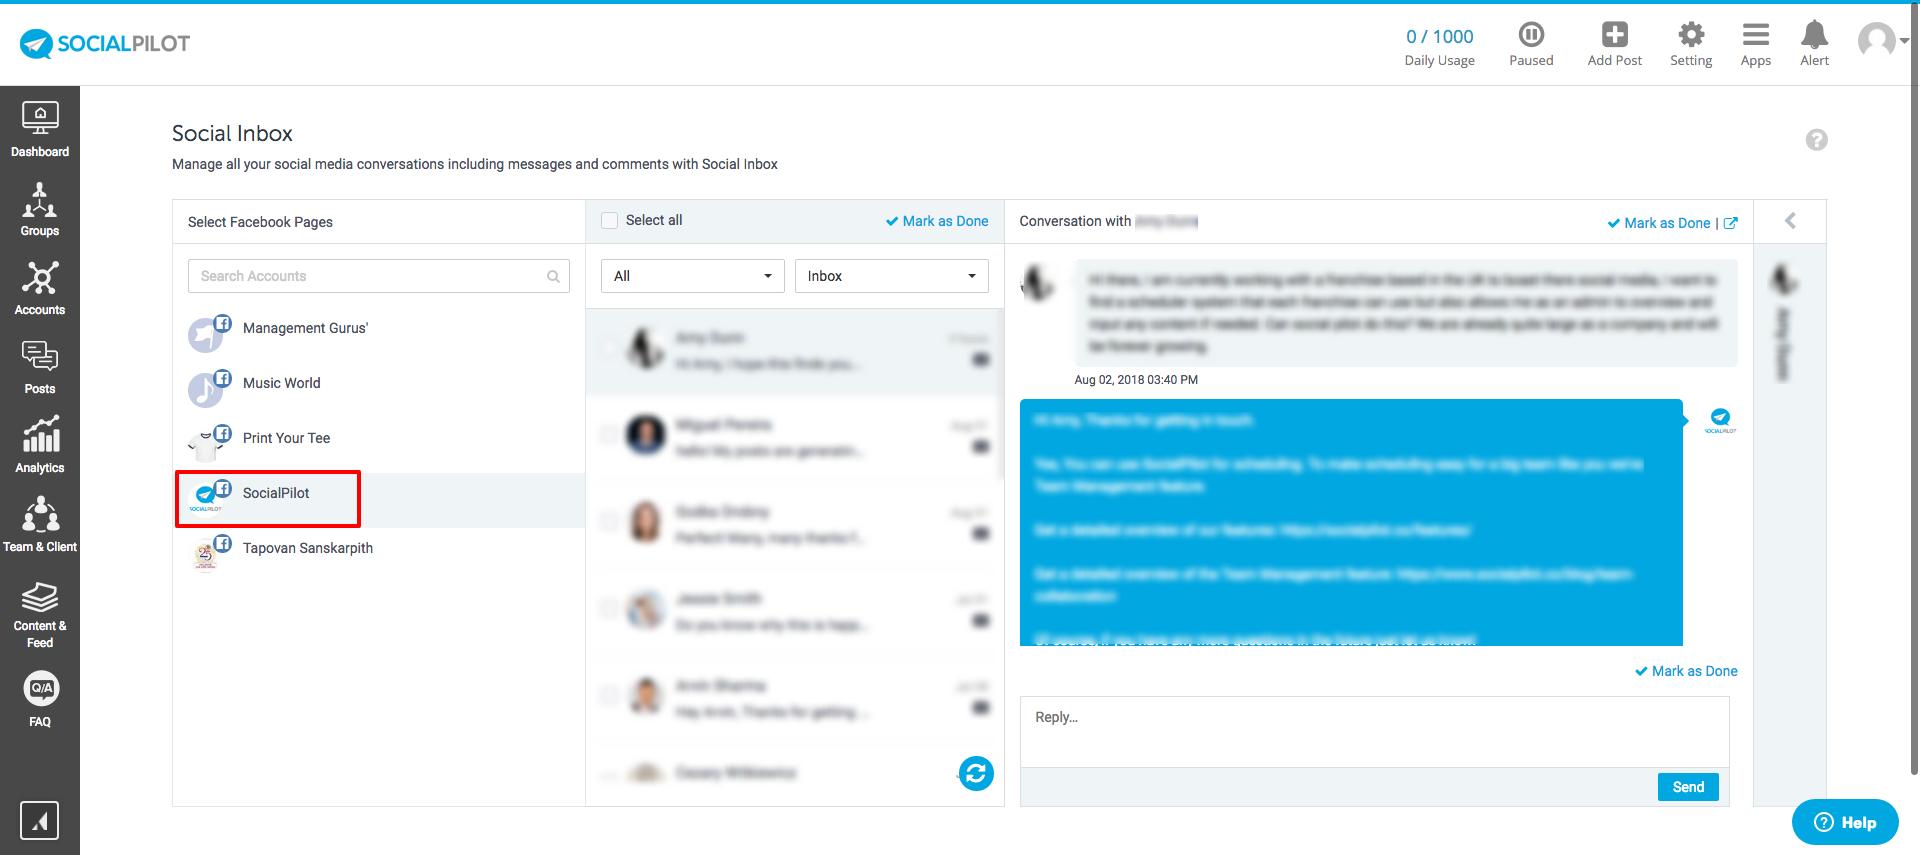 What is Social Inbox? - SocialPilot Help